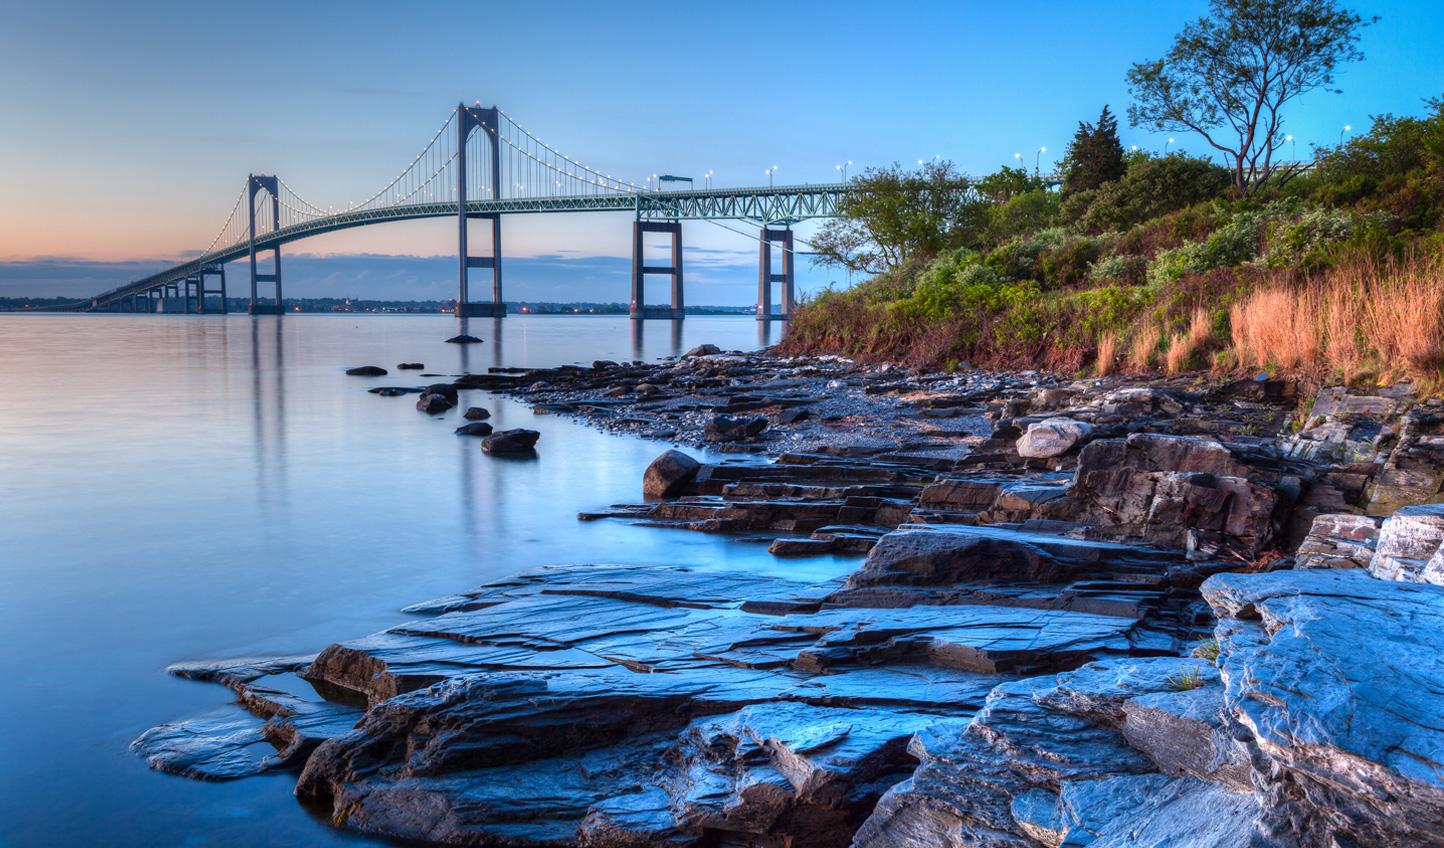 Don't miss the Newport Bridge that hangs over Narragansett Bay